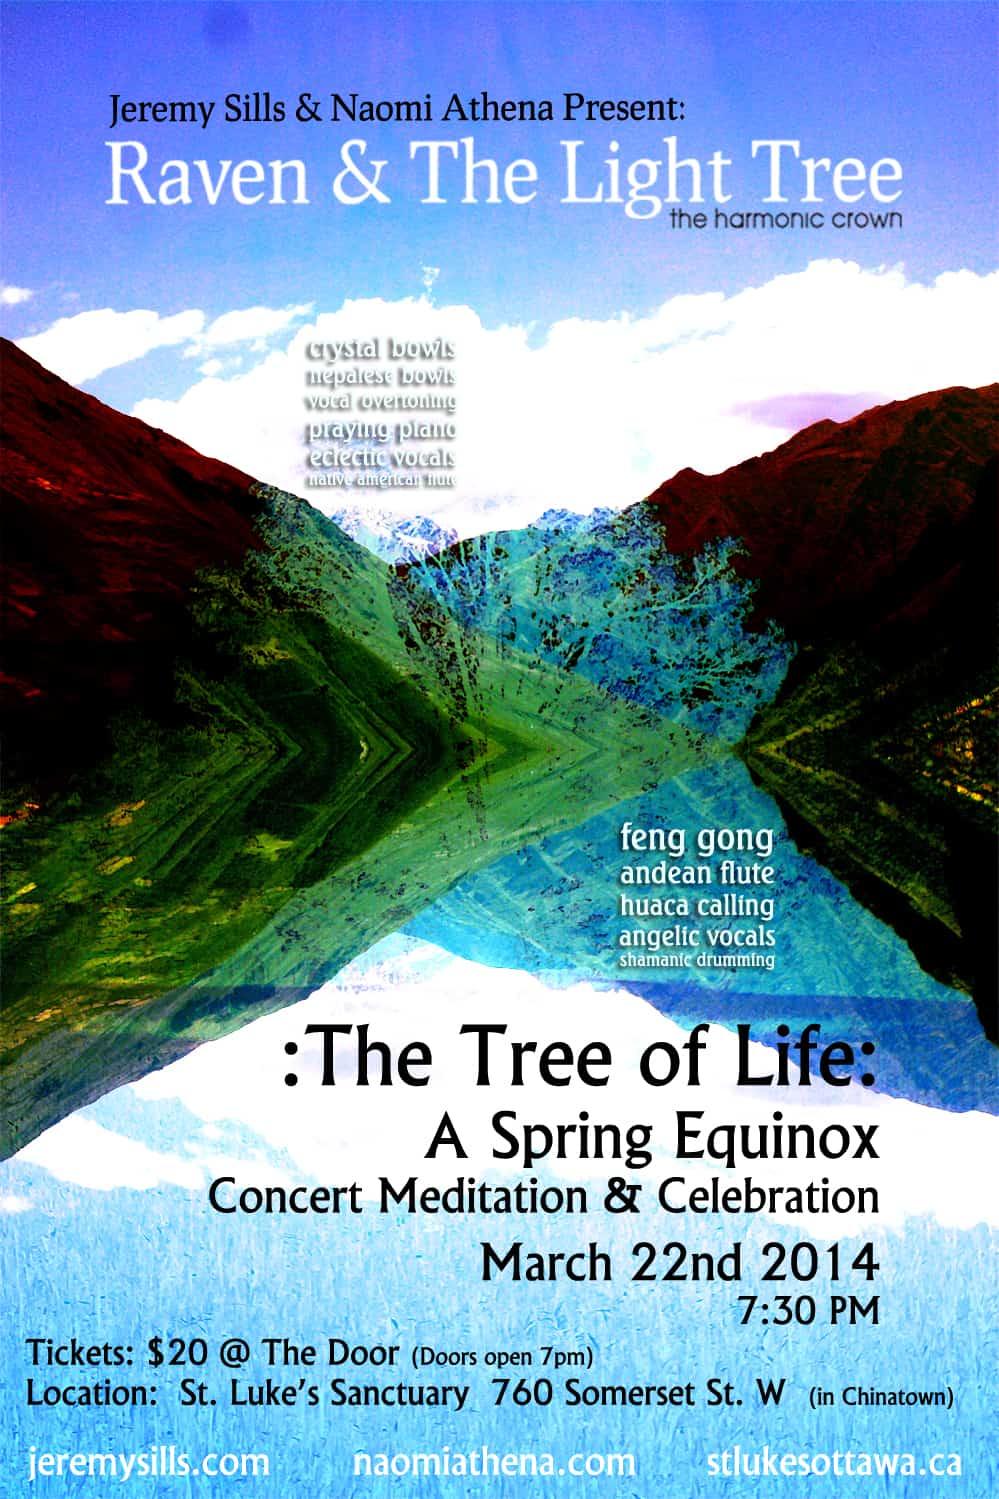 treeoflife_springequinox_2014 WEB